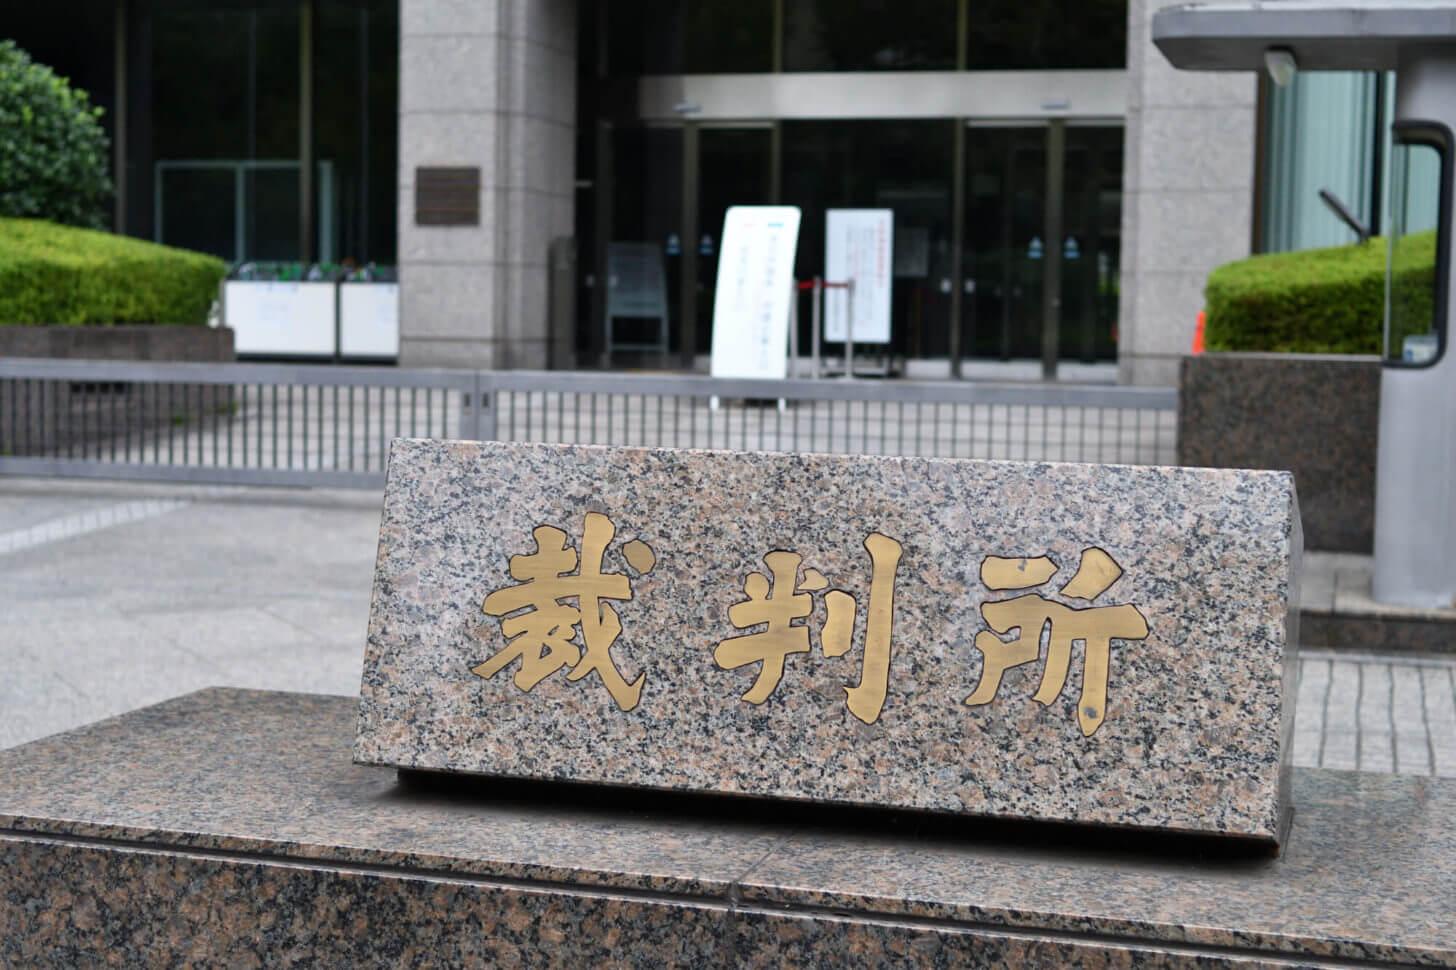 東京家庭裁判所・簡易裁判所の入り口